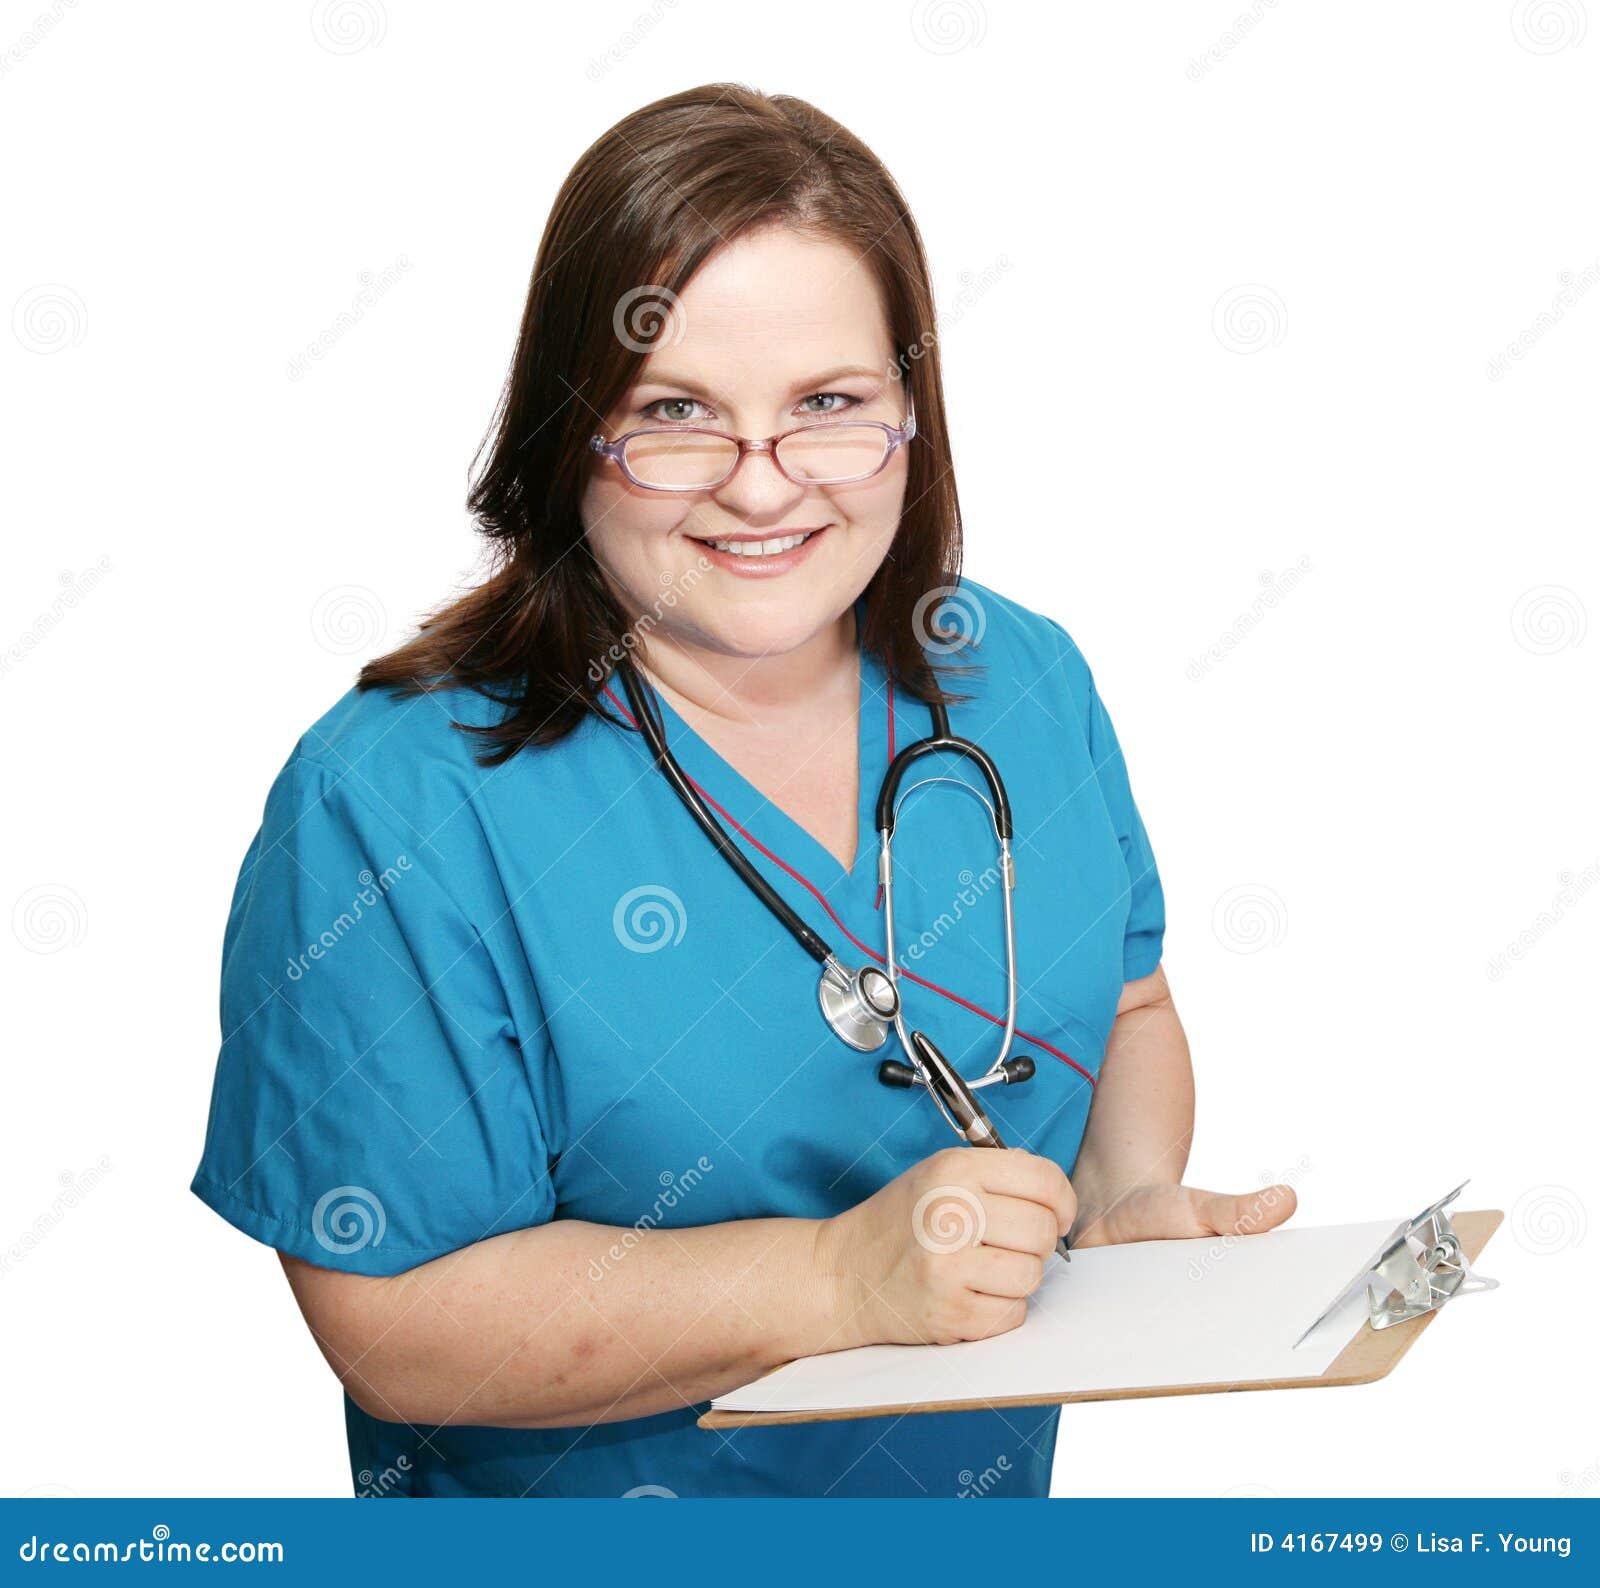 Art History different types of nursing majors